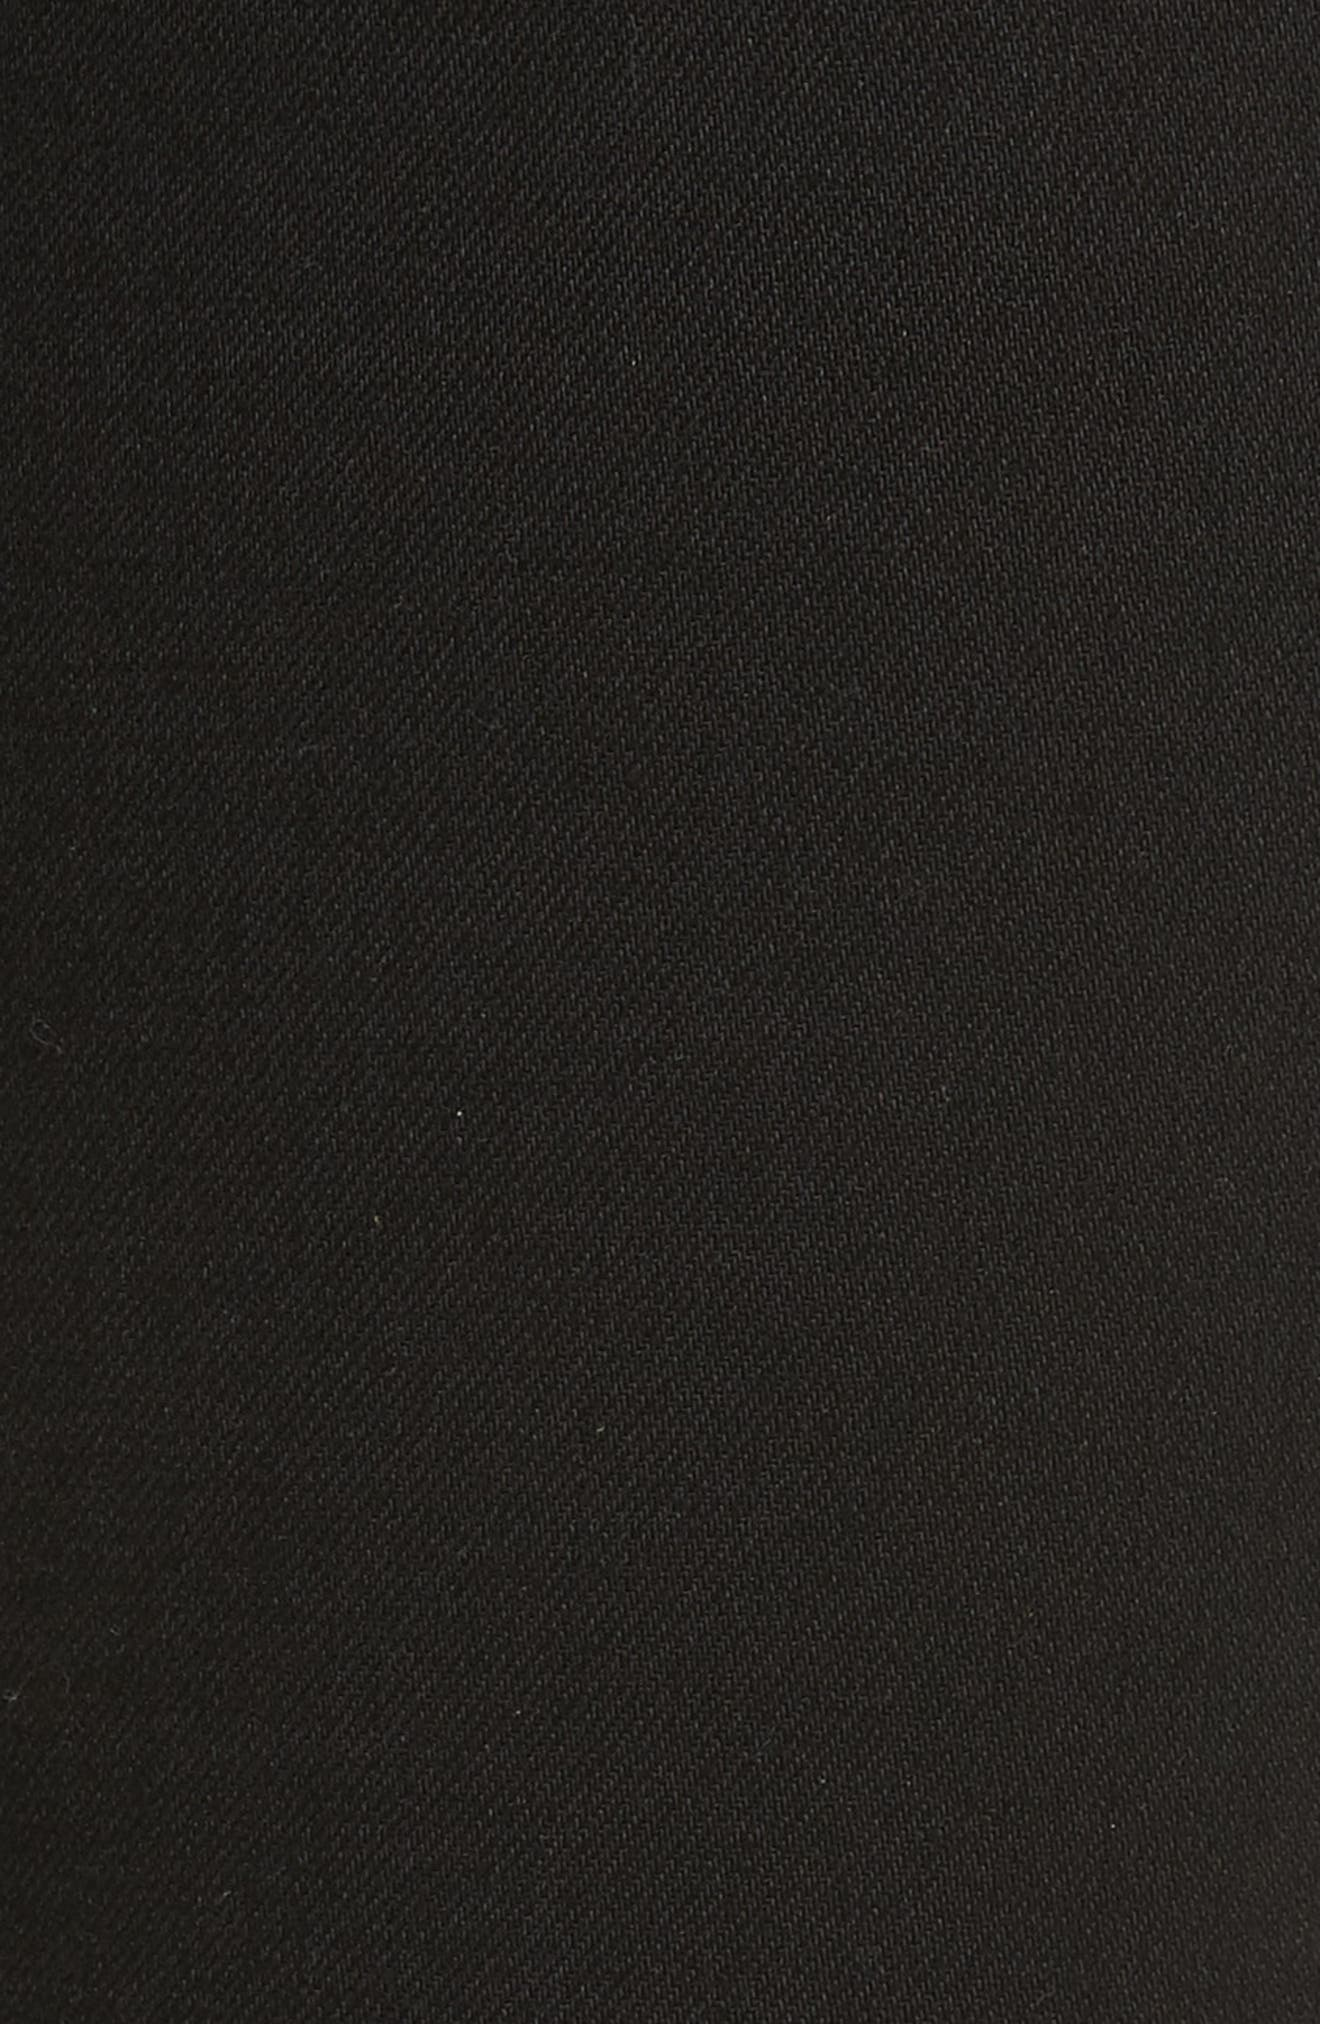 Mito High Waist Skinny Jeans,                             Alternate thumbnail 5, color,                             Black